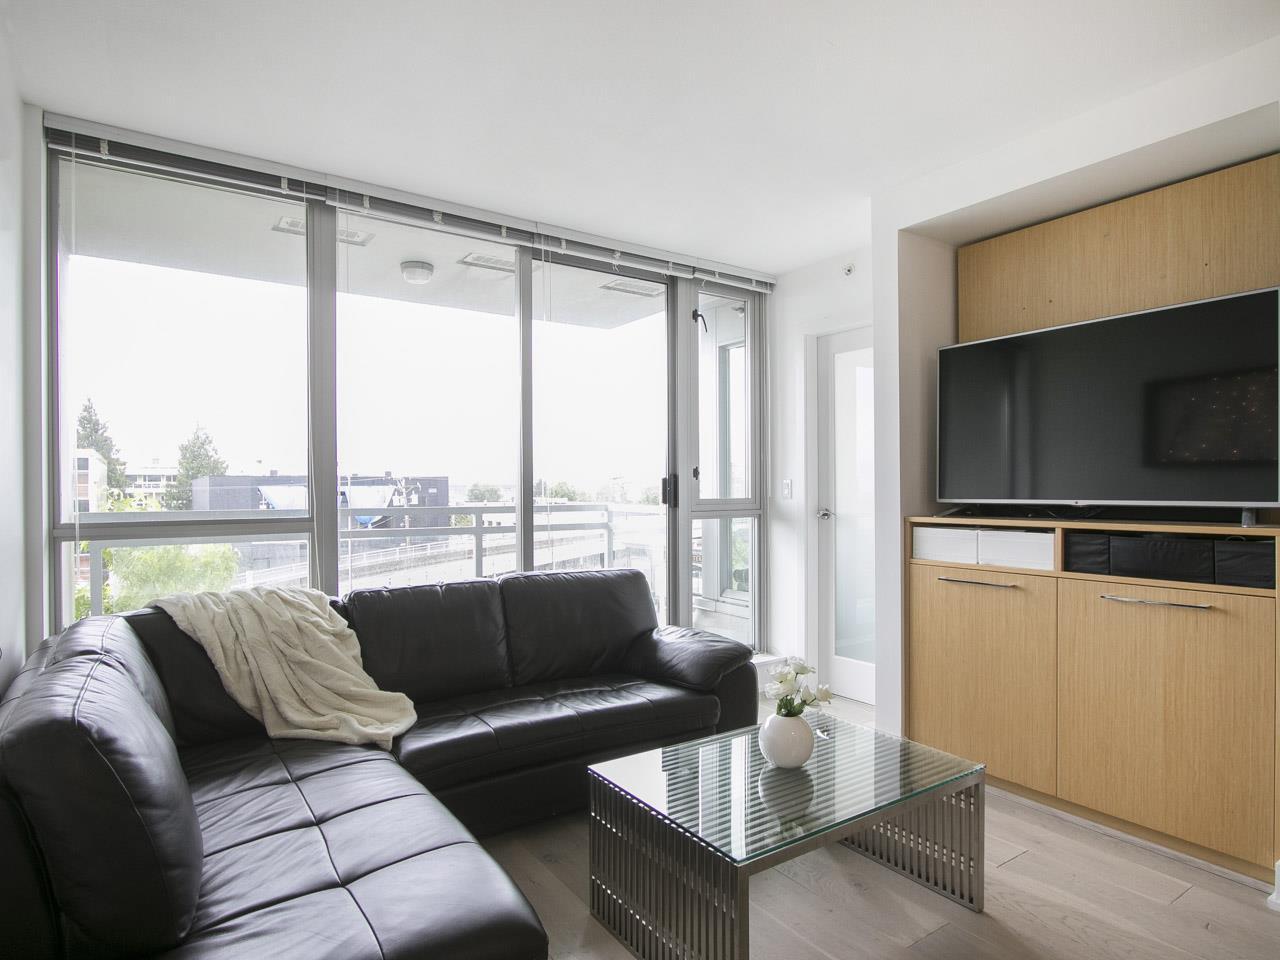 Condo Apartment at 310 1680 W 4TH AVENUE, Unit 310, Vancouver West, British Columbia. Image 5